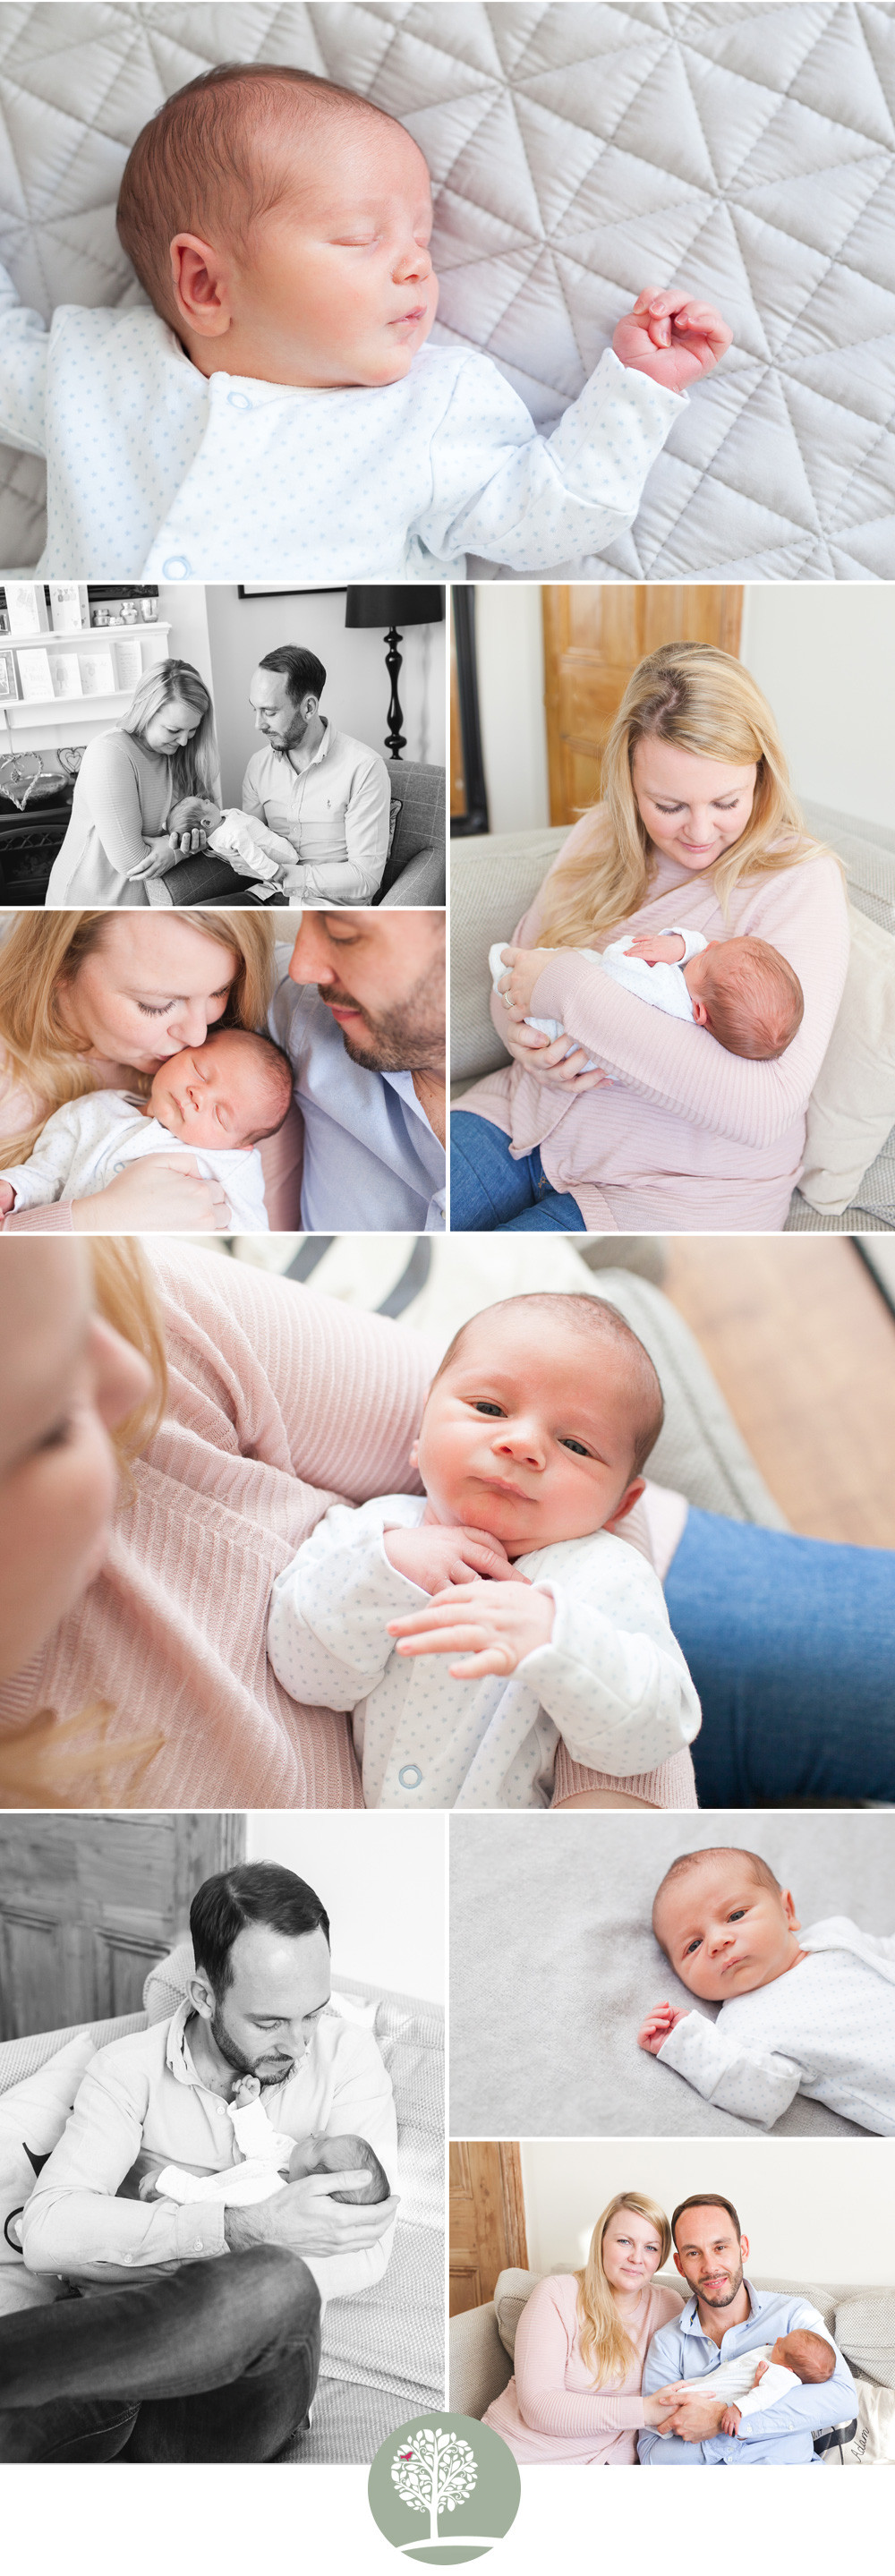 Surbiton Newborn Photography | Kingston Newborn Photography